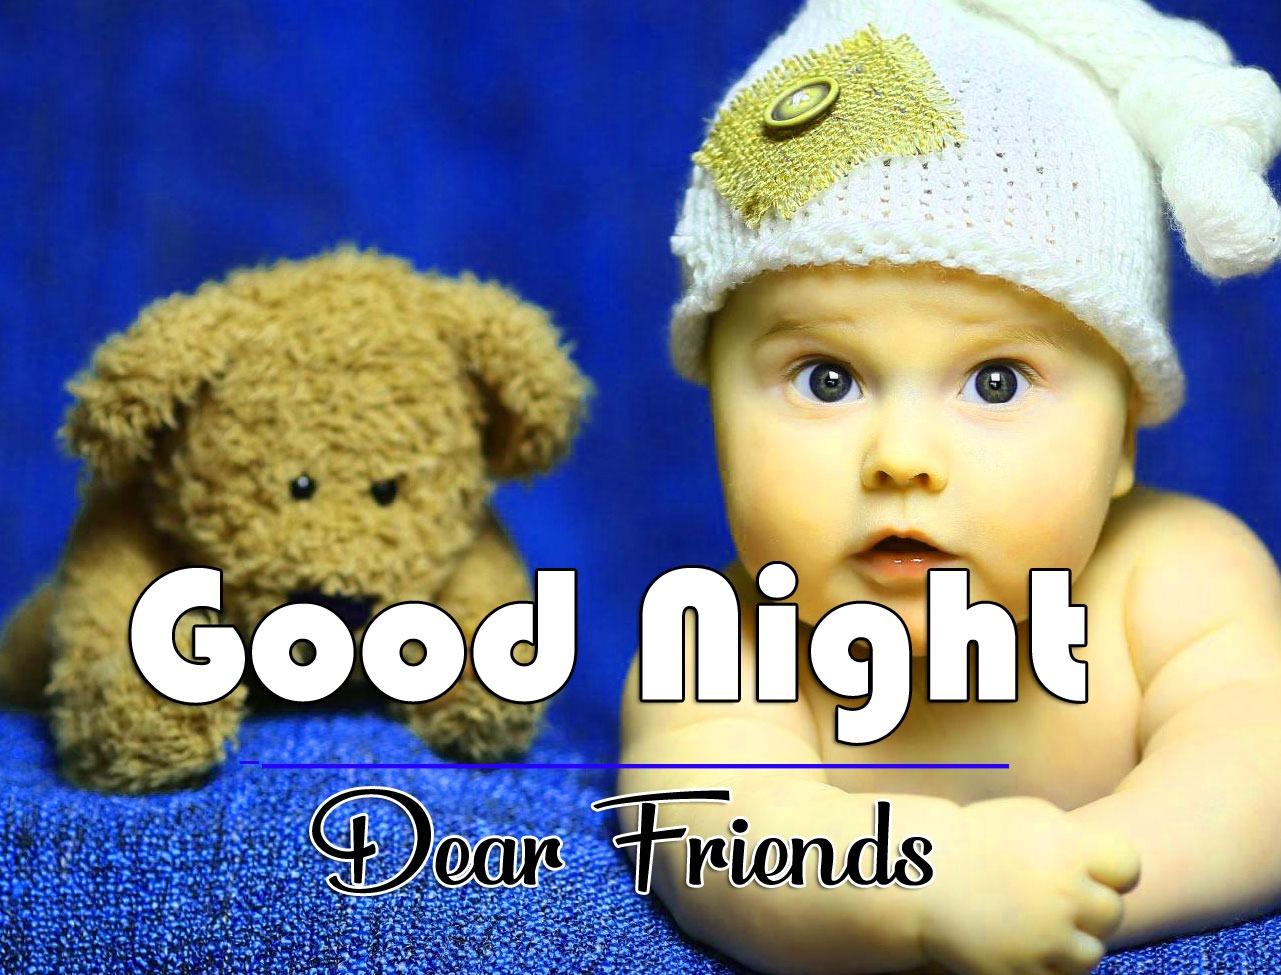 fULL HD HD Good Night Images